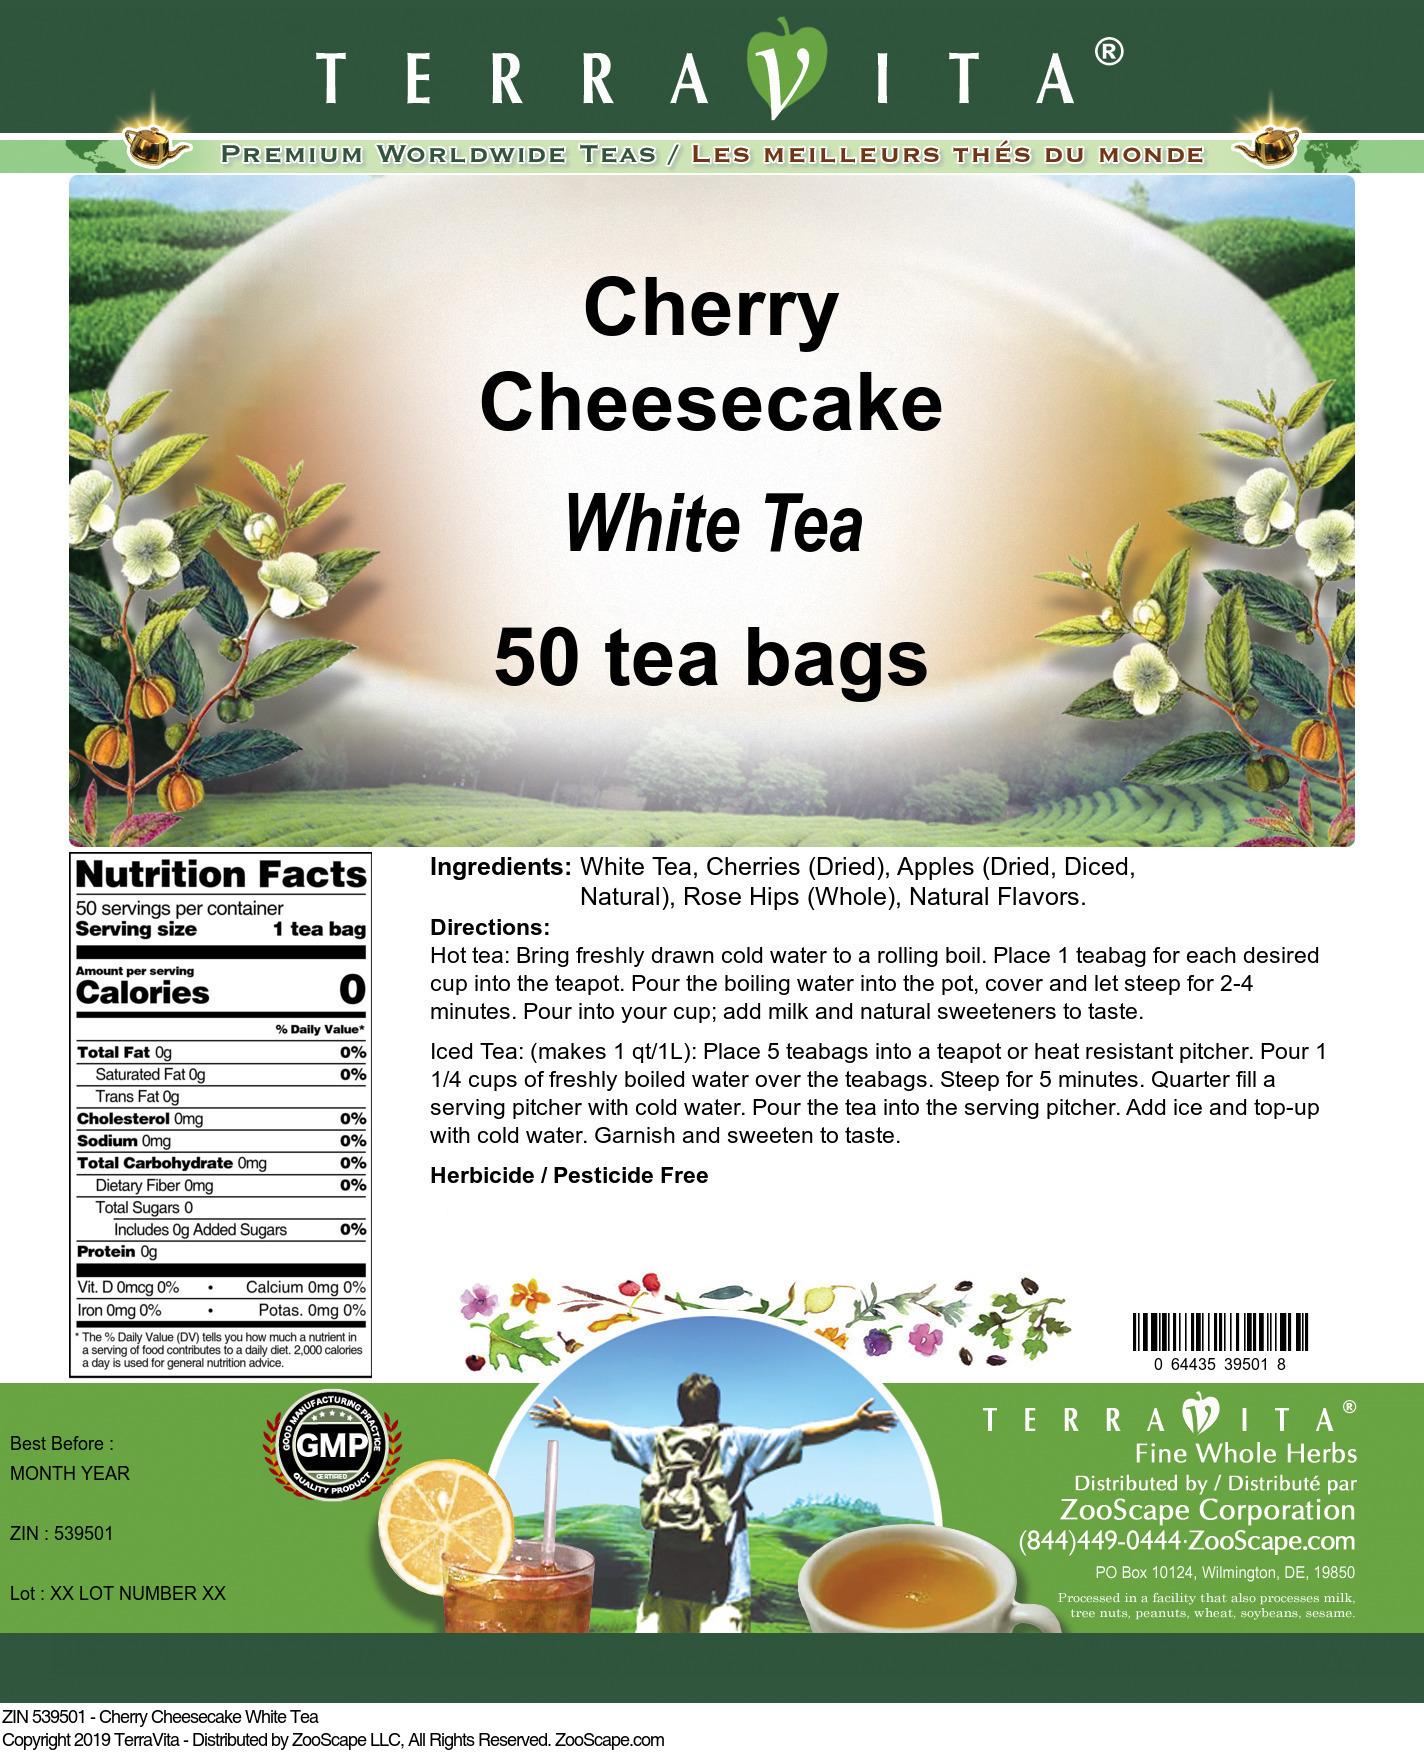 Cherry Cheesecake White Tea